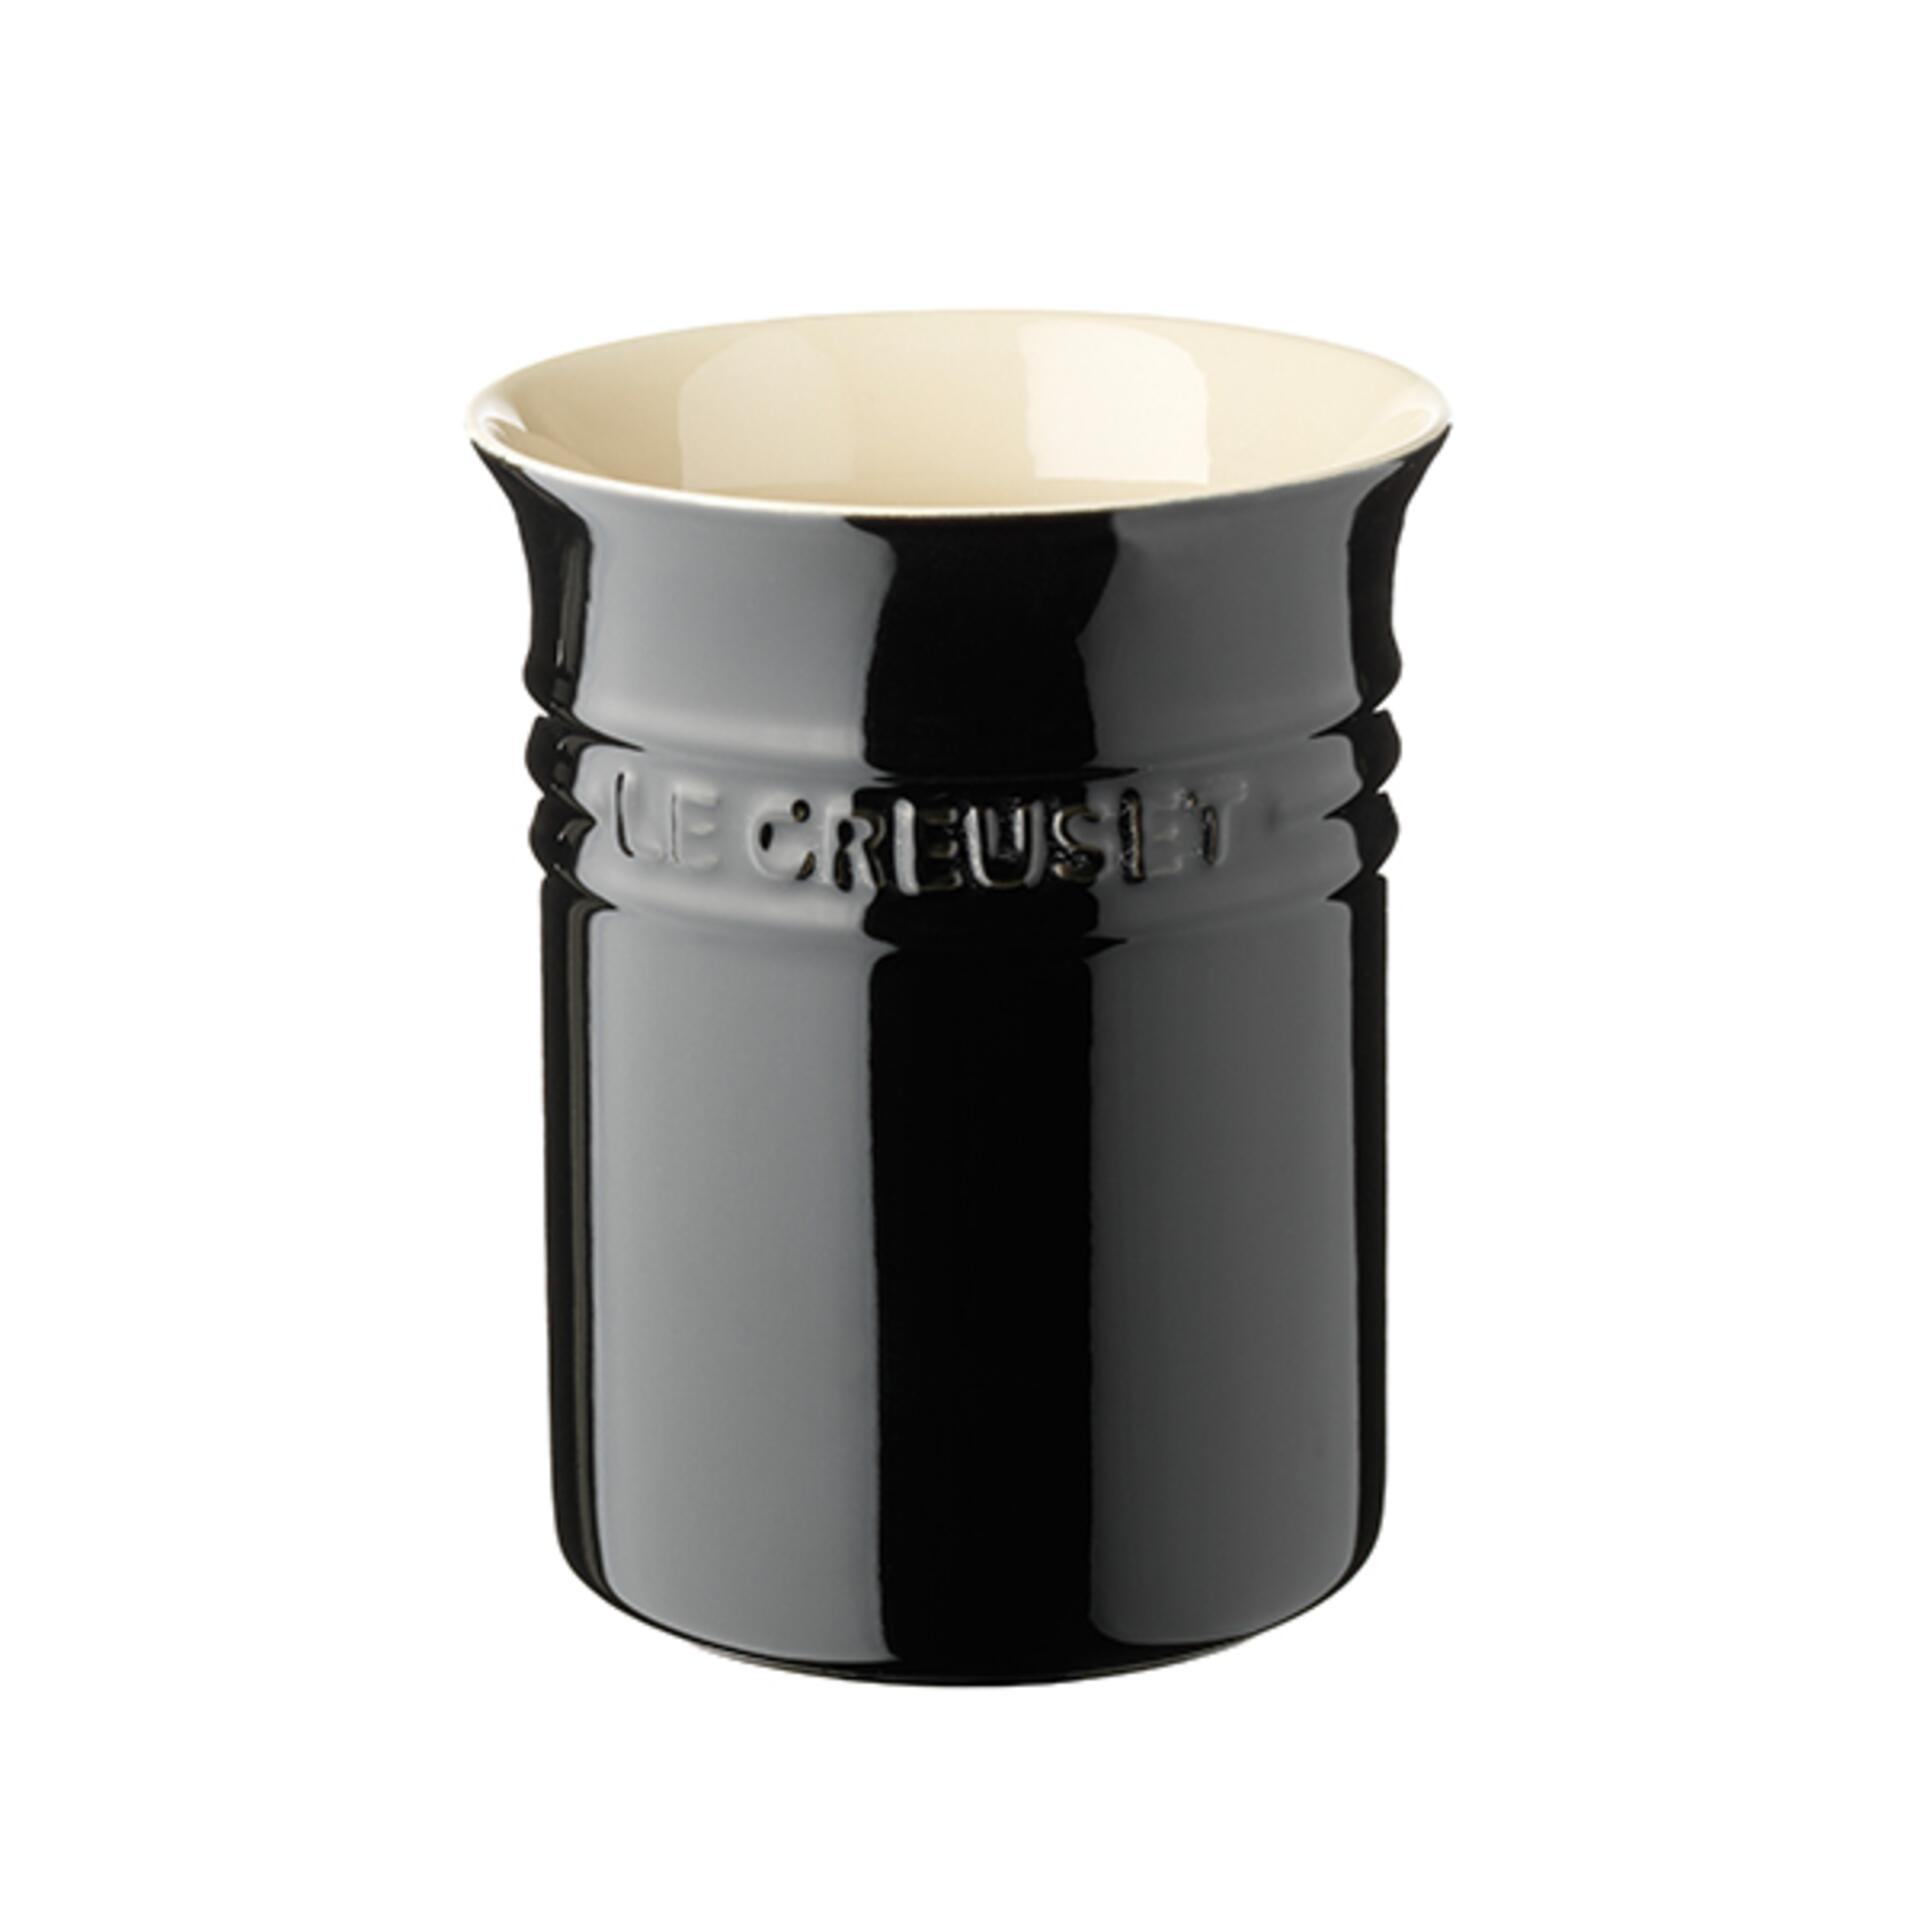 Le Creuset Topf für Kochkellen Schwarz